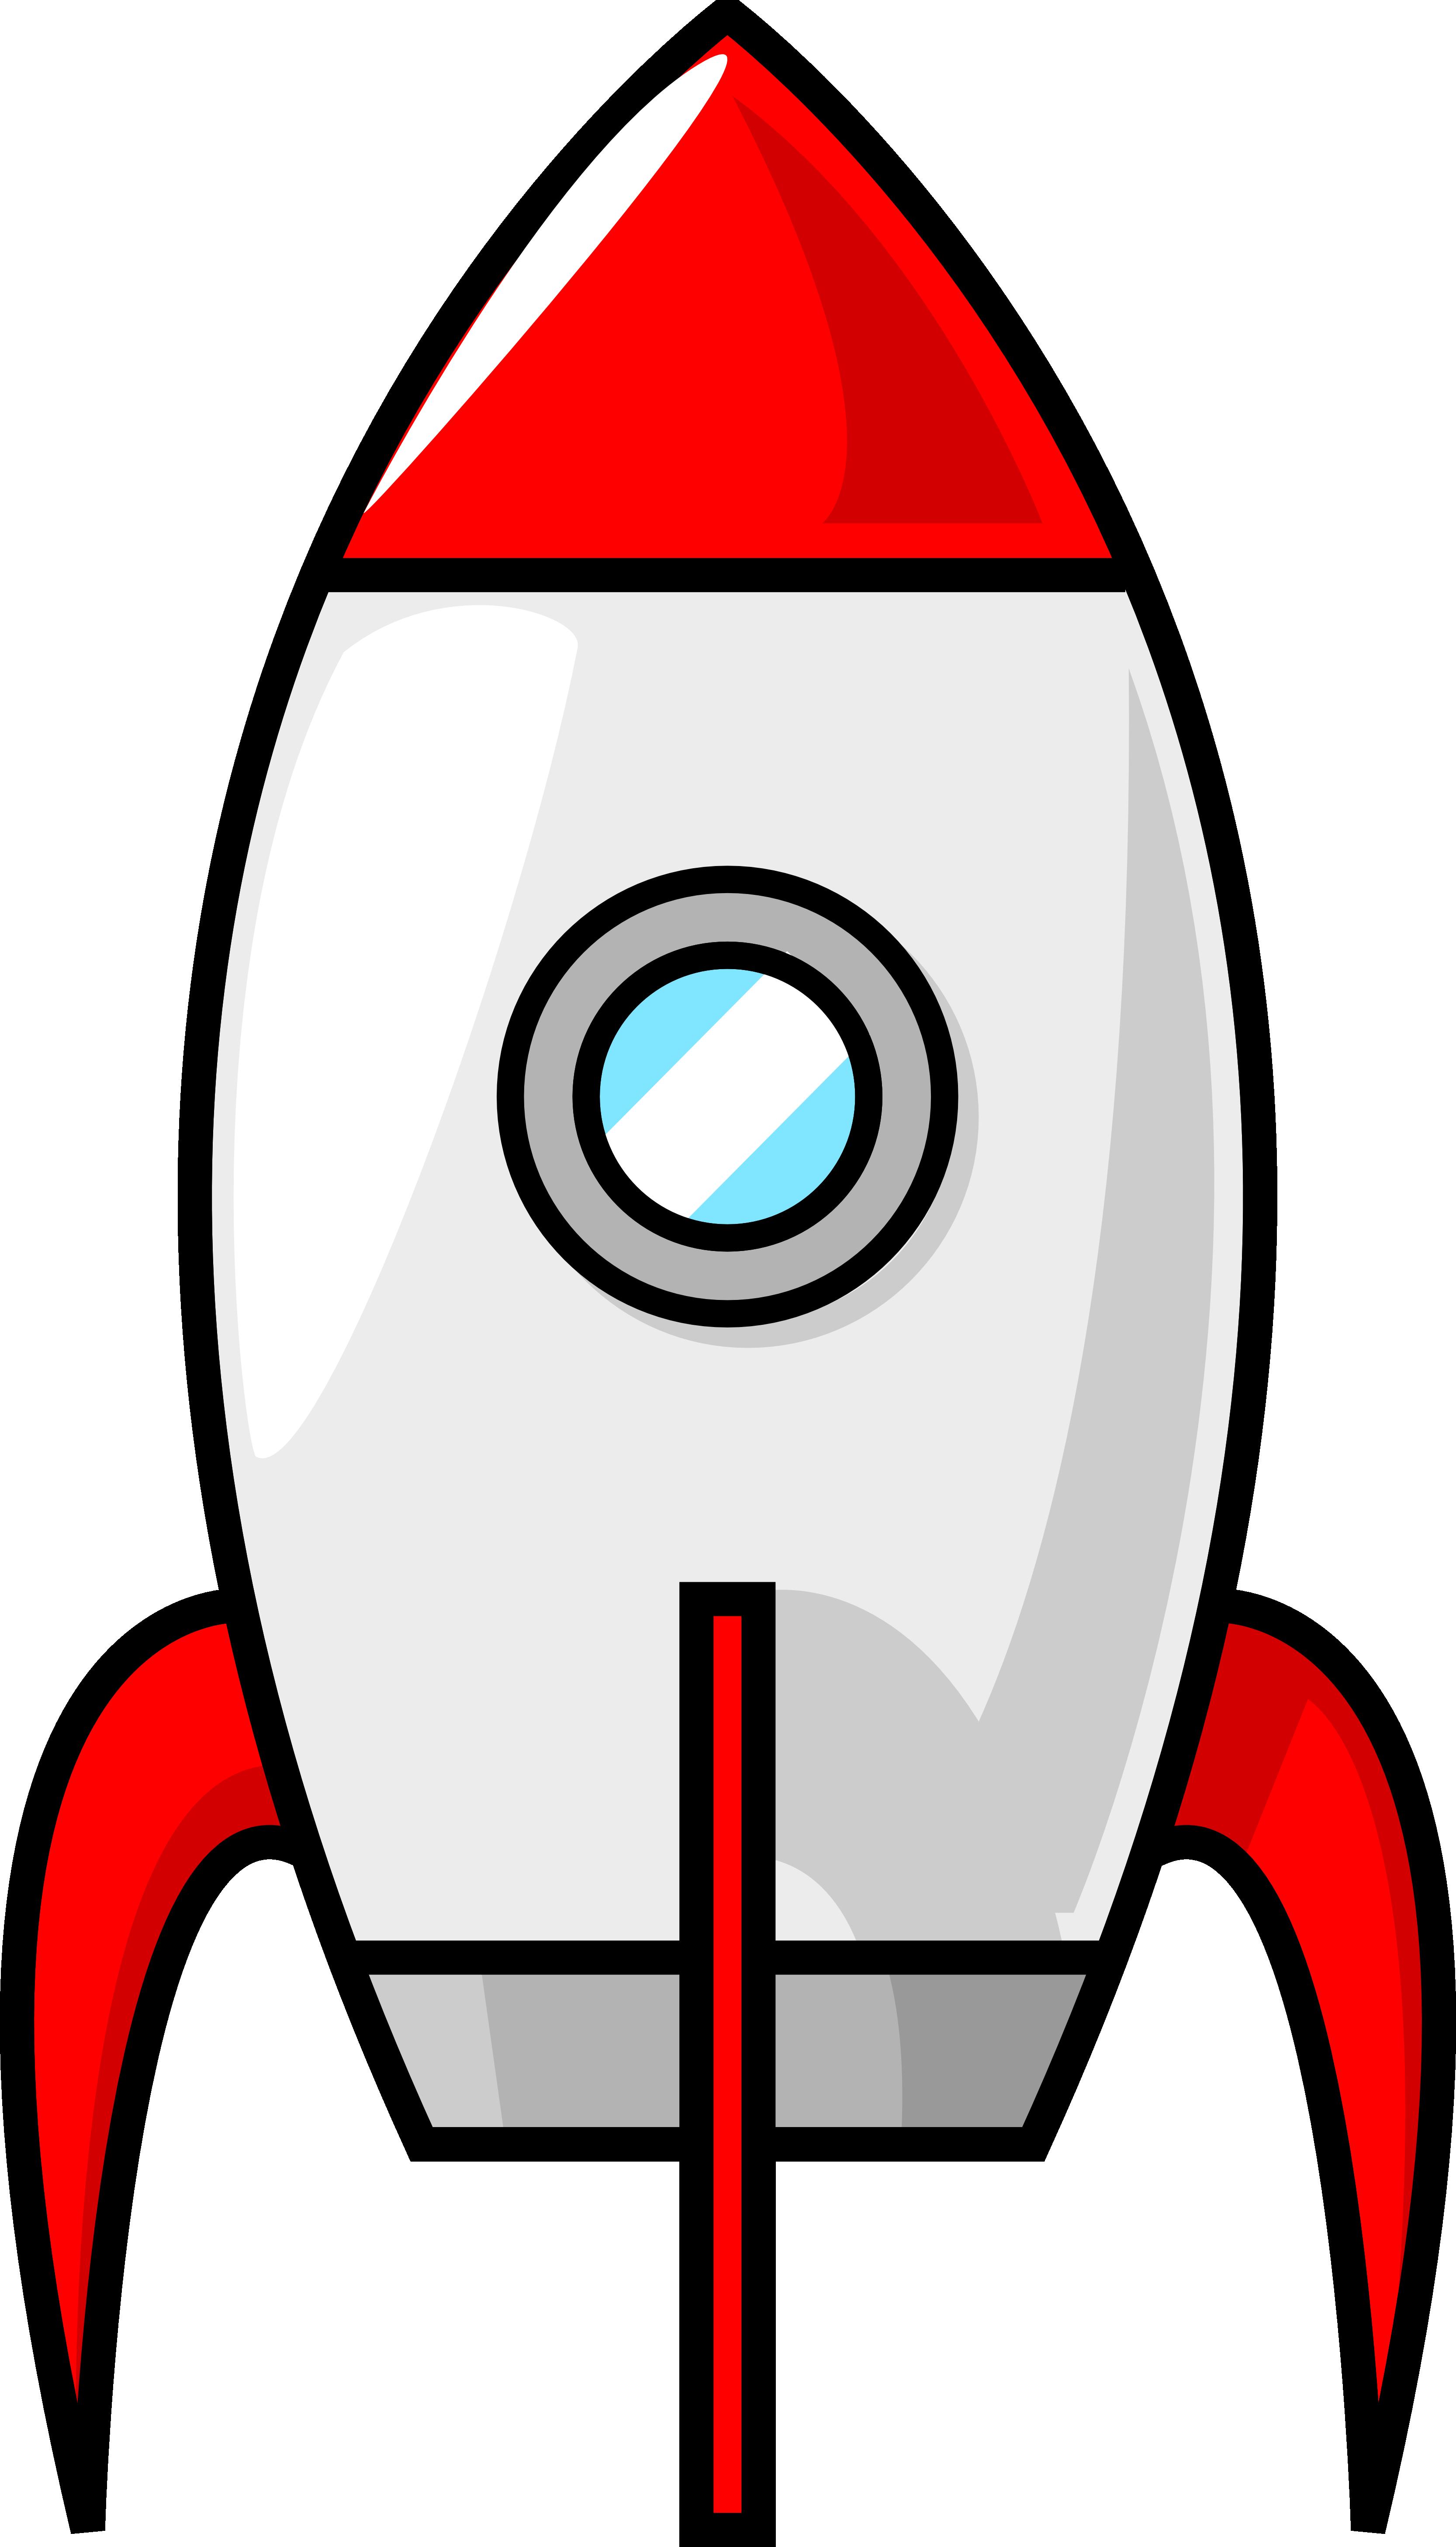 Free Rocket Pics, Download Free Clip Art, Free Clip Art on.